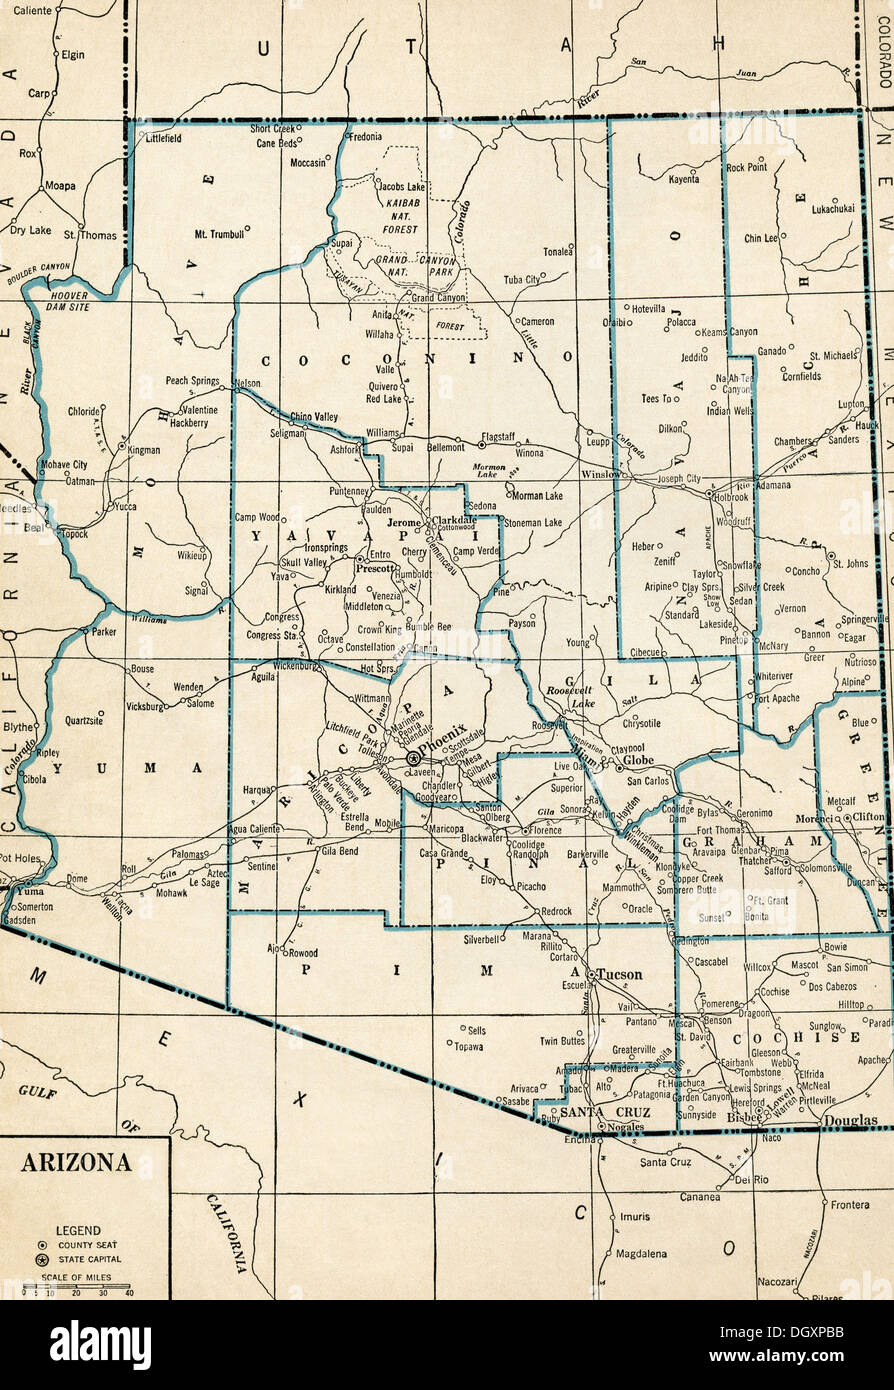 Old map of Arizona state, 1930's Stock Photo: 62053919 - Alamy Map Of Arizona State on map of alaska, map of washington state, map of california state, map of maine state, map of nevada state, map of alabama state, map of texas state, map of new mexico, map of idaho state, map of florida, map of ohio state, map of metro state denver, map of vermont state, map of illinois, flag of arizona state, map of pennsylvania state, map of miss state, map of wyoming state, city of arizona state, map of oregon state,